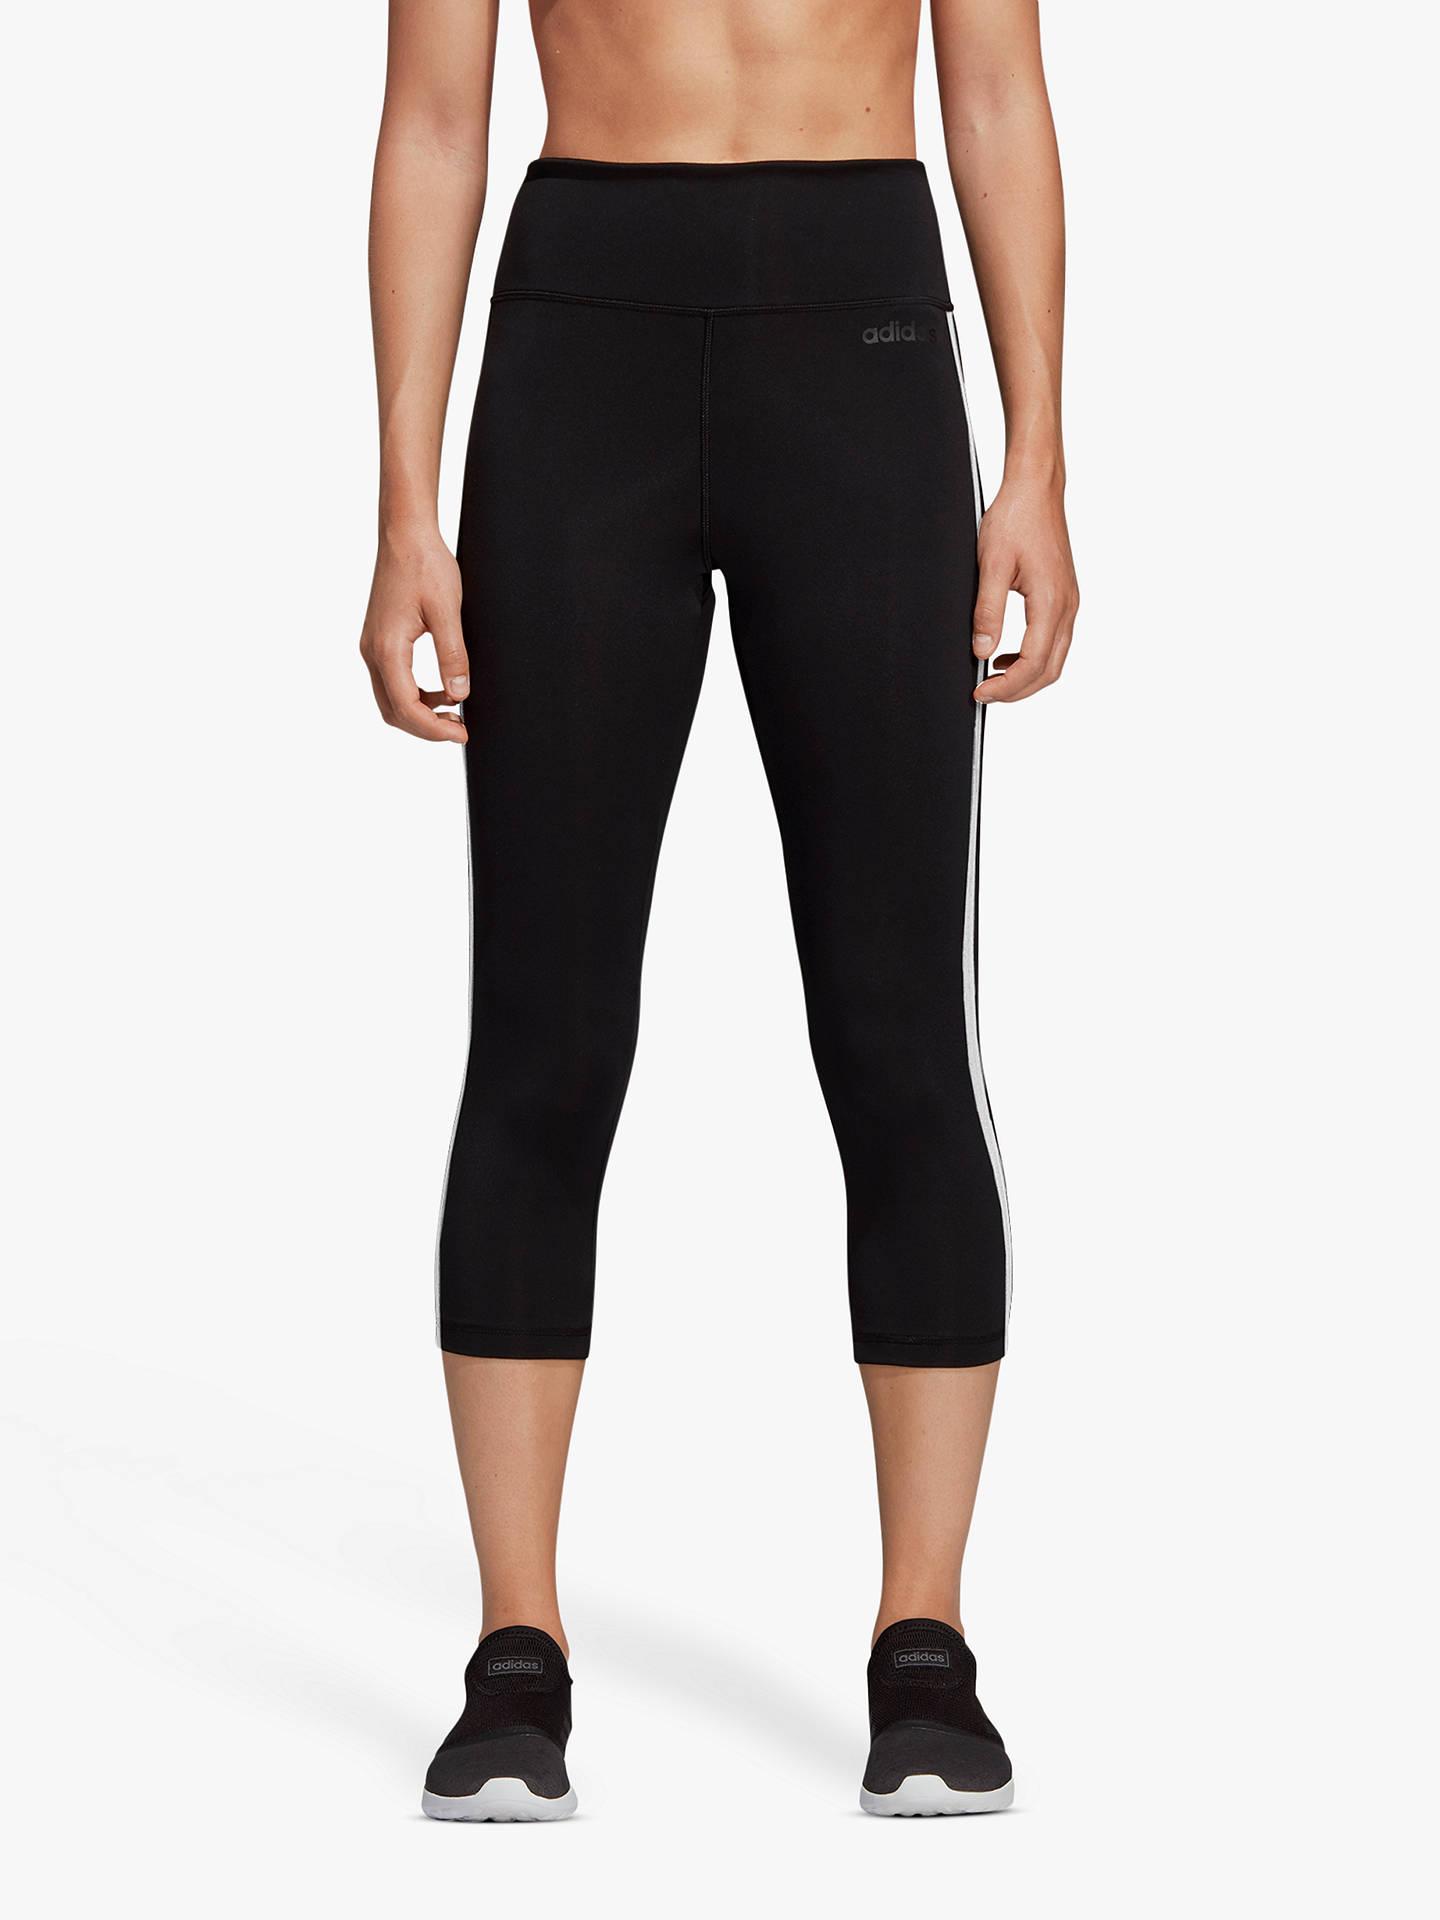 3057787be5956 Buy adidas Design 2 Move 3 Stripes 3/4 Training Tights, Black, XS ...